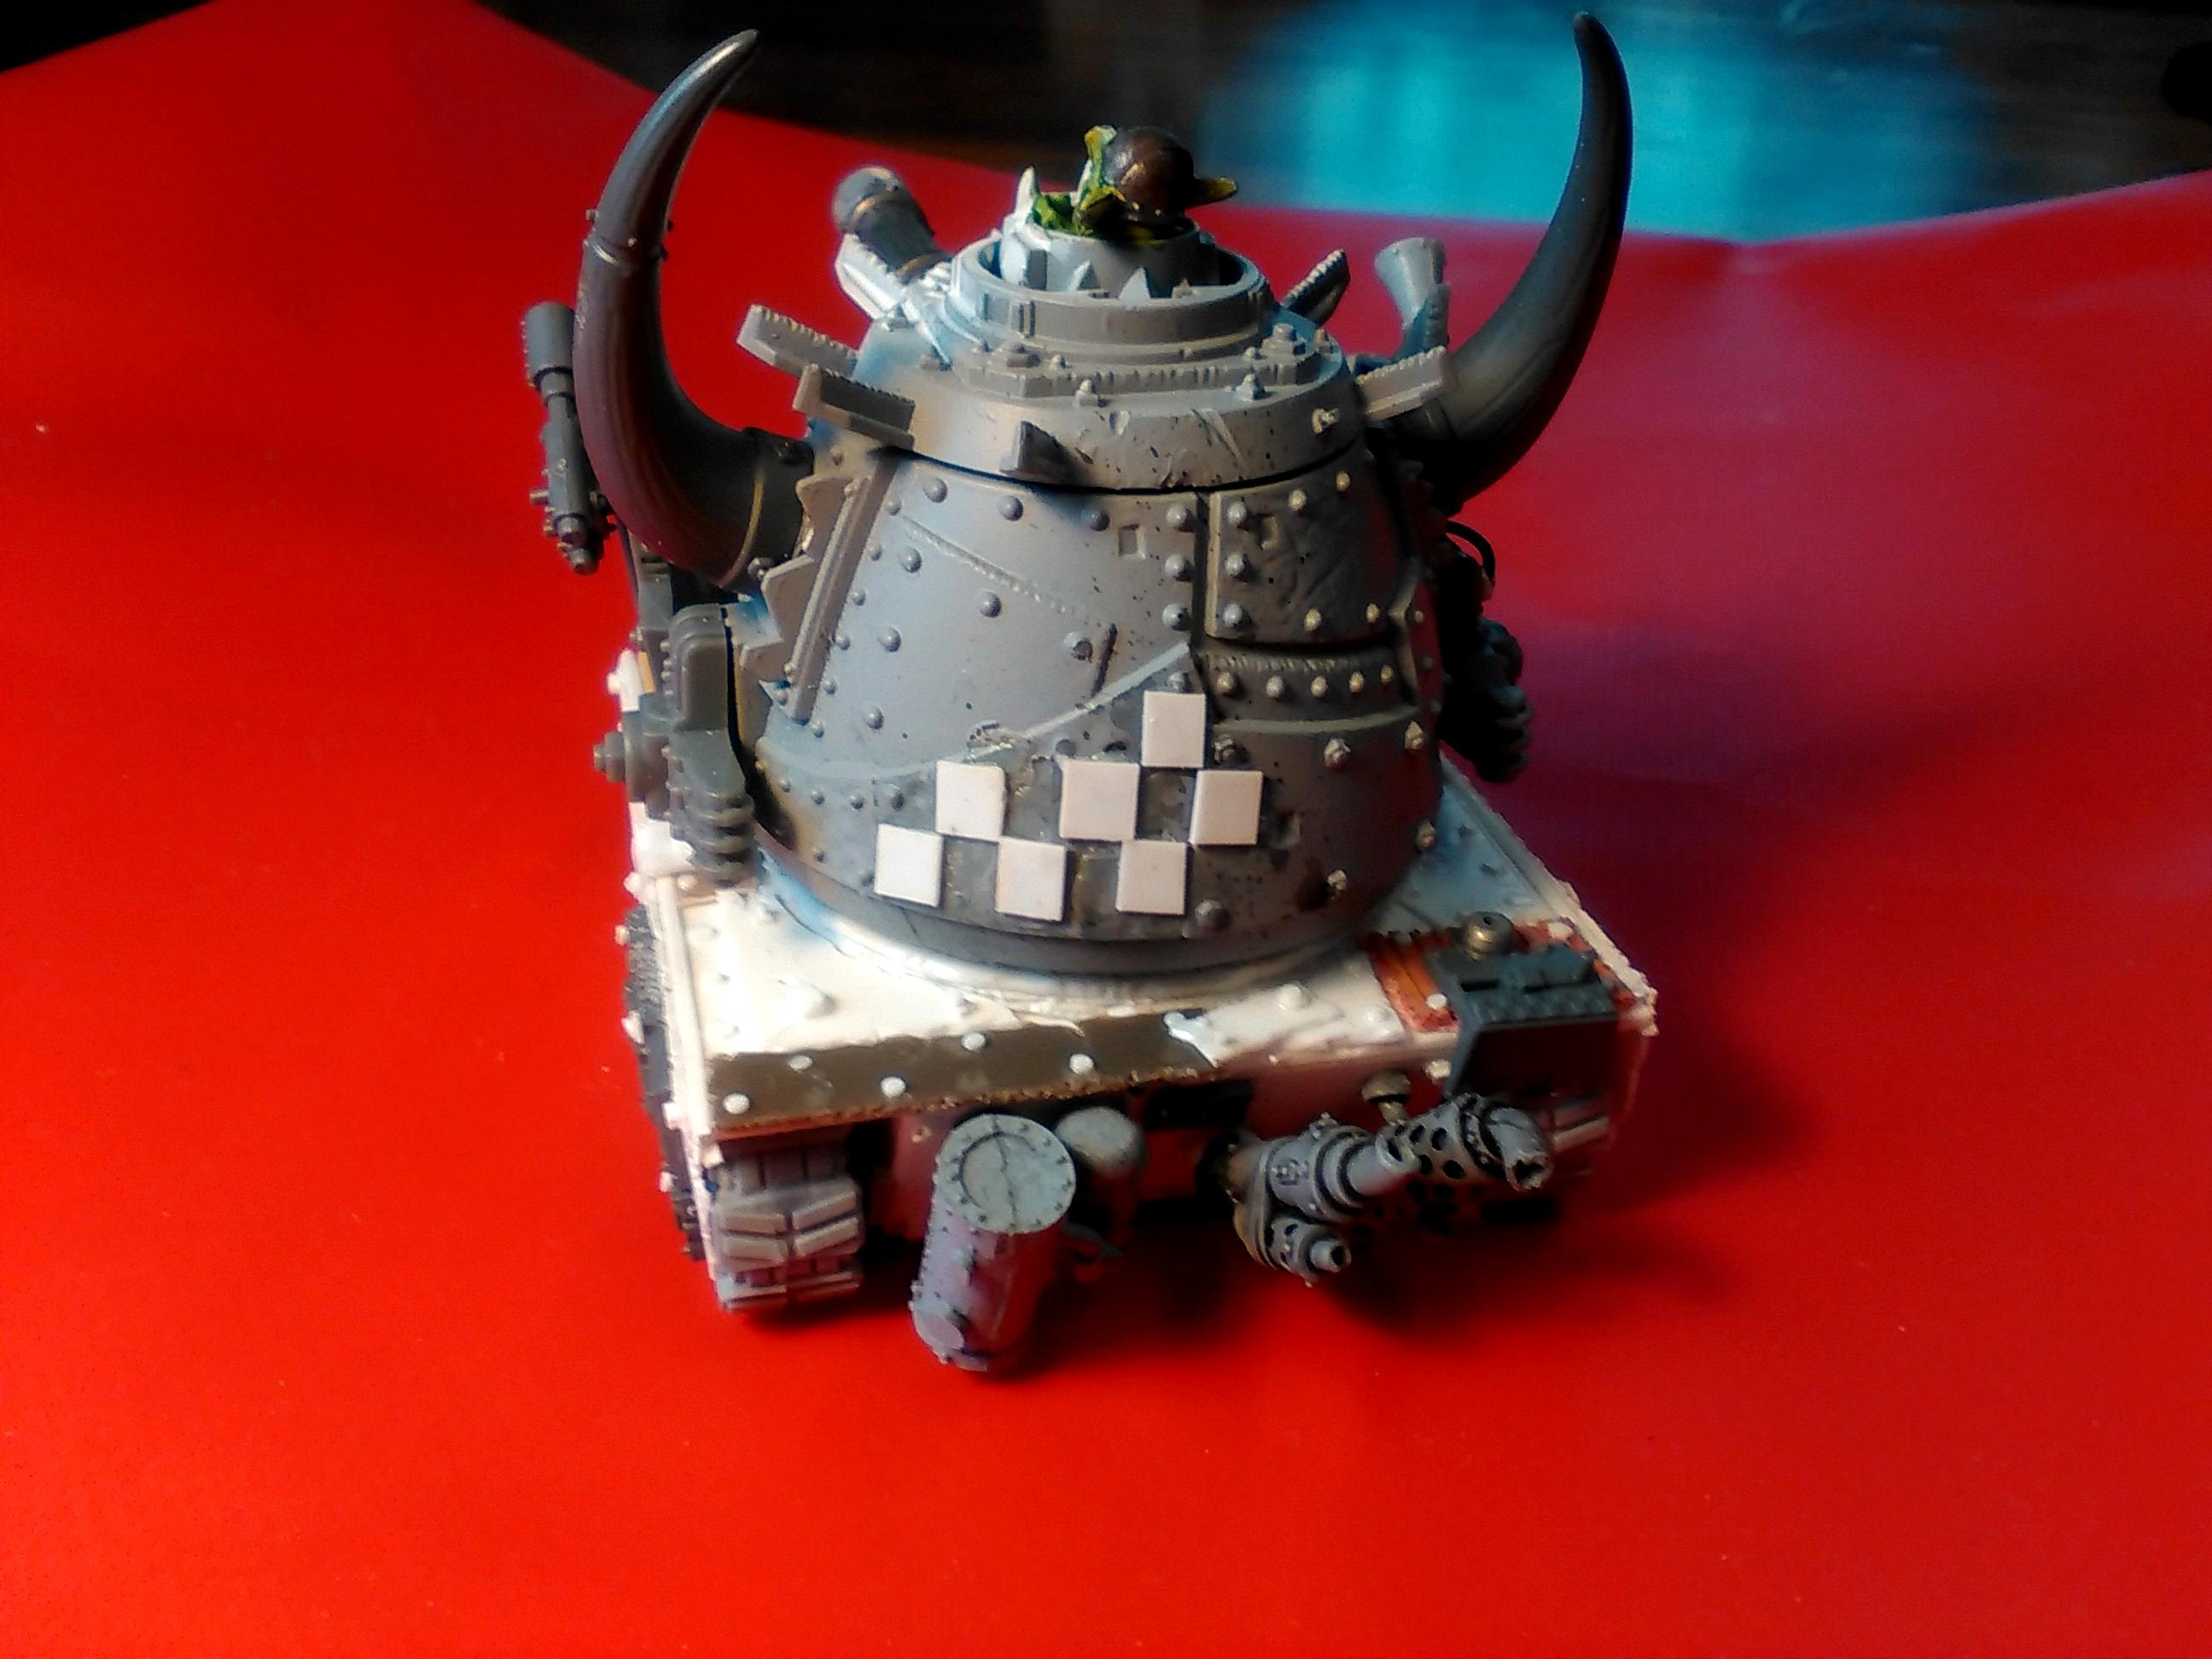 Conversion, Grot Conversion, Grot Tank, Grot Tank 3, Grots, Kitbash, Kitbashed, Ork Conversions, Ork Coustom Made Vehicles, Orks, Scratch Build, Warhammer 40,000